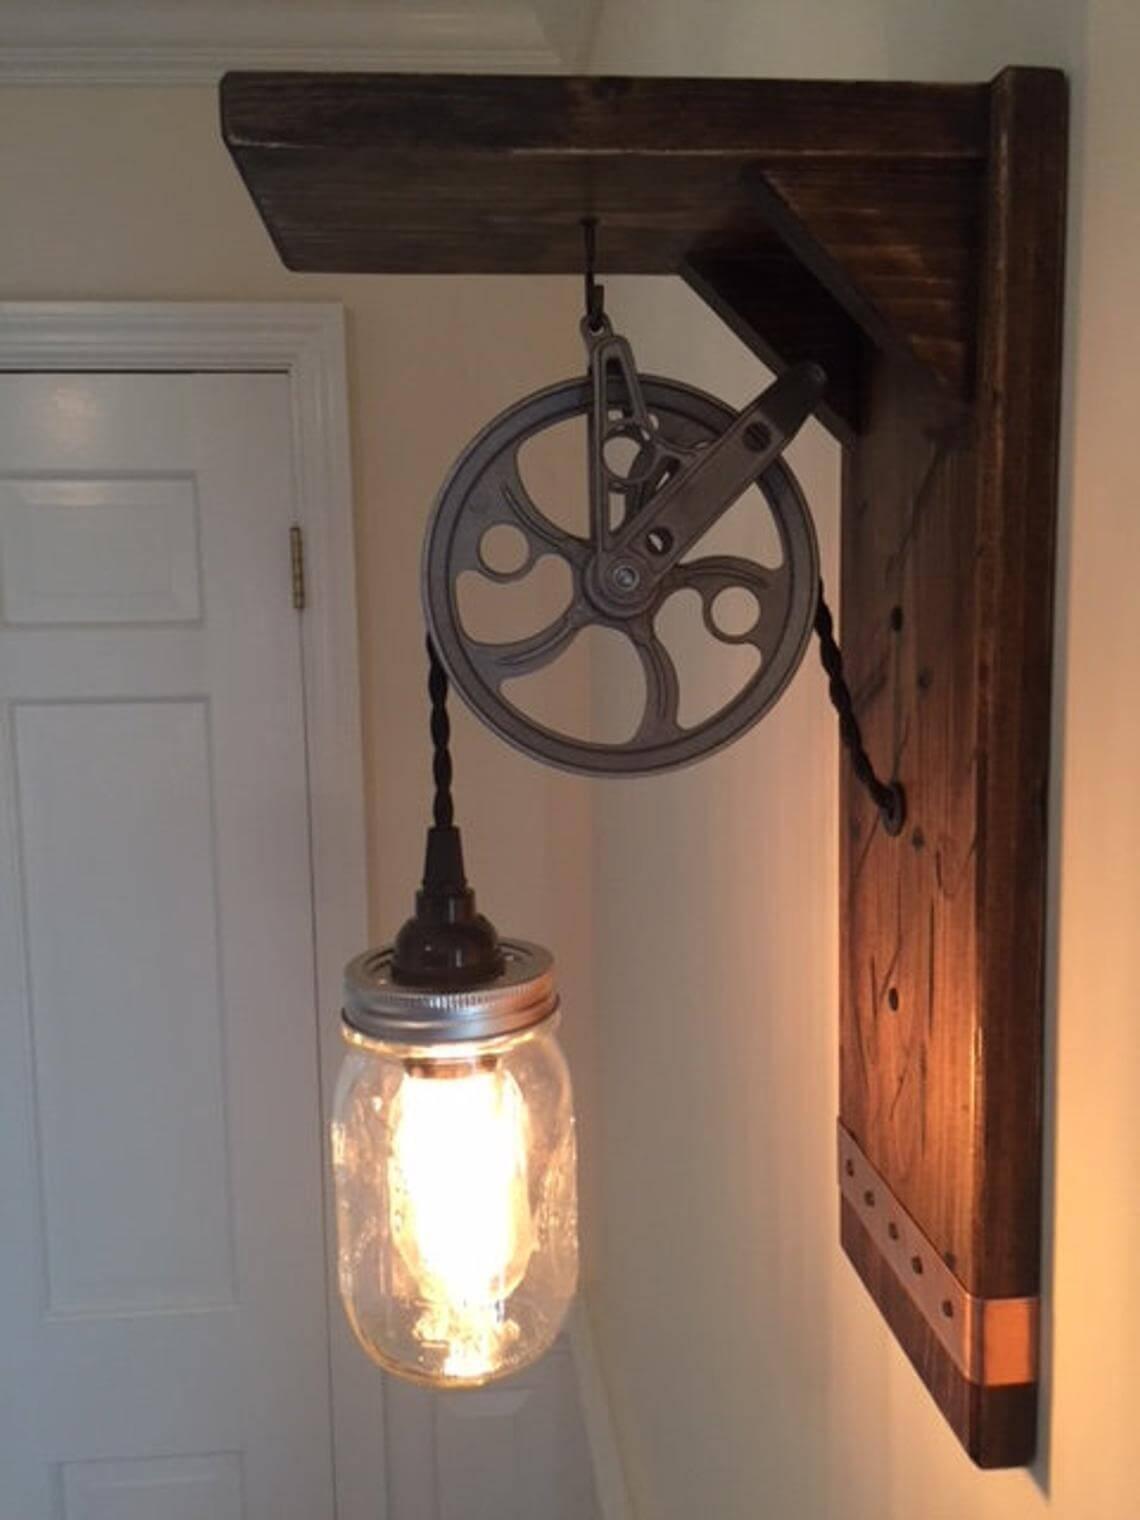 Farmhouse Steampunk Inspired Wall Lighting